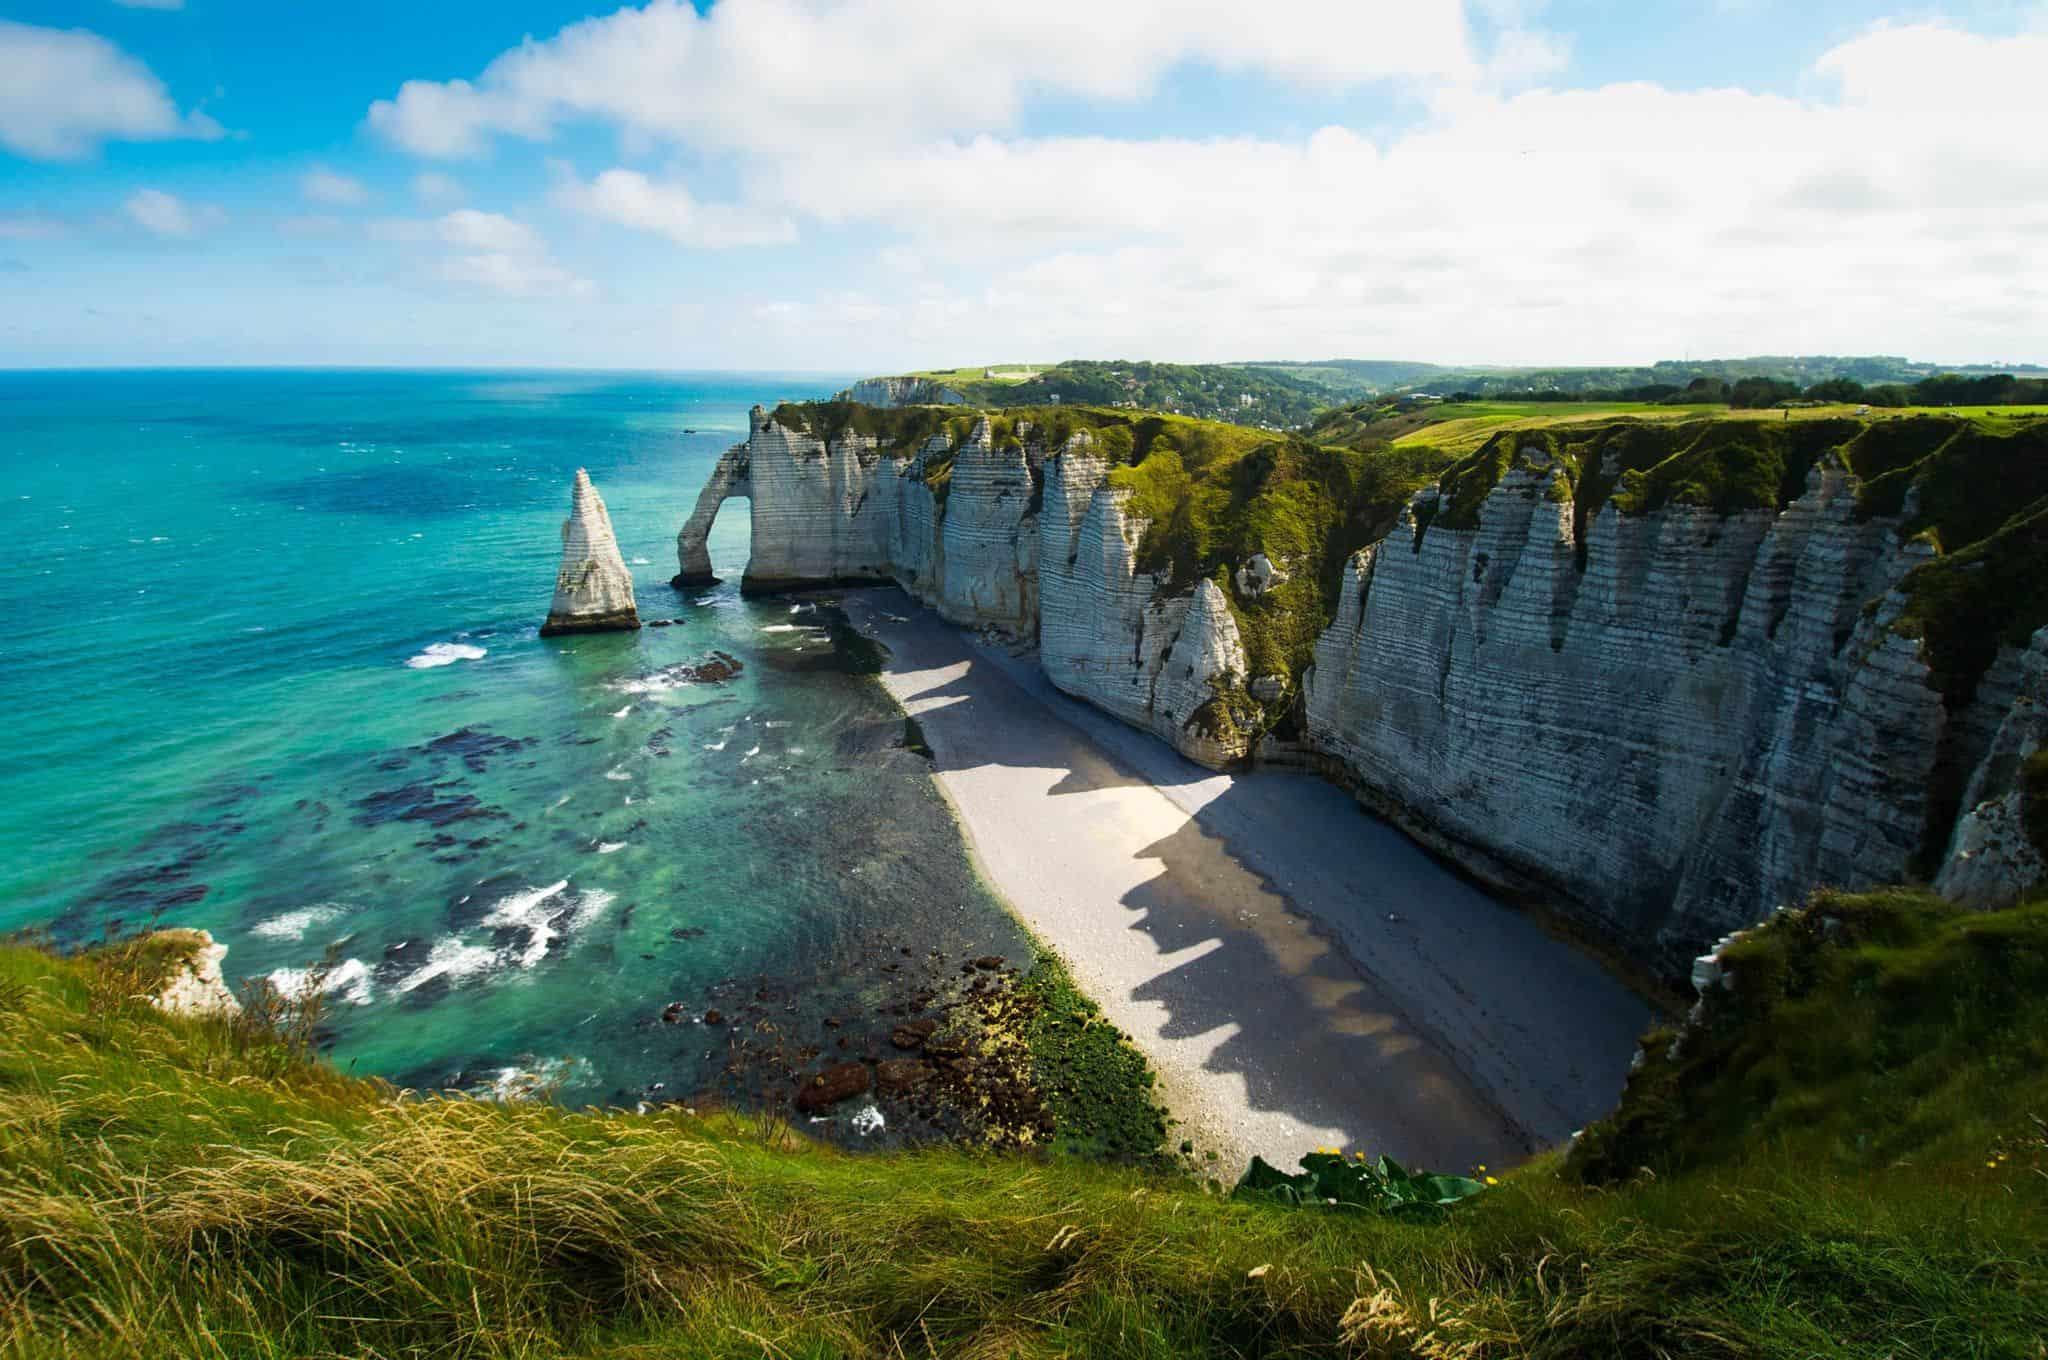 Les falaises d'Étretat en Normandie